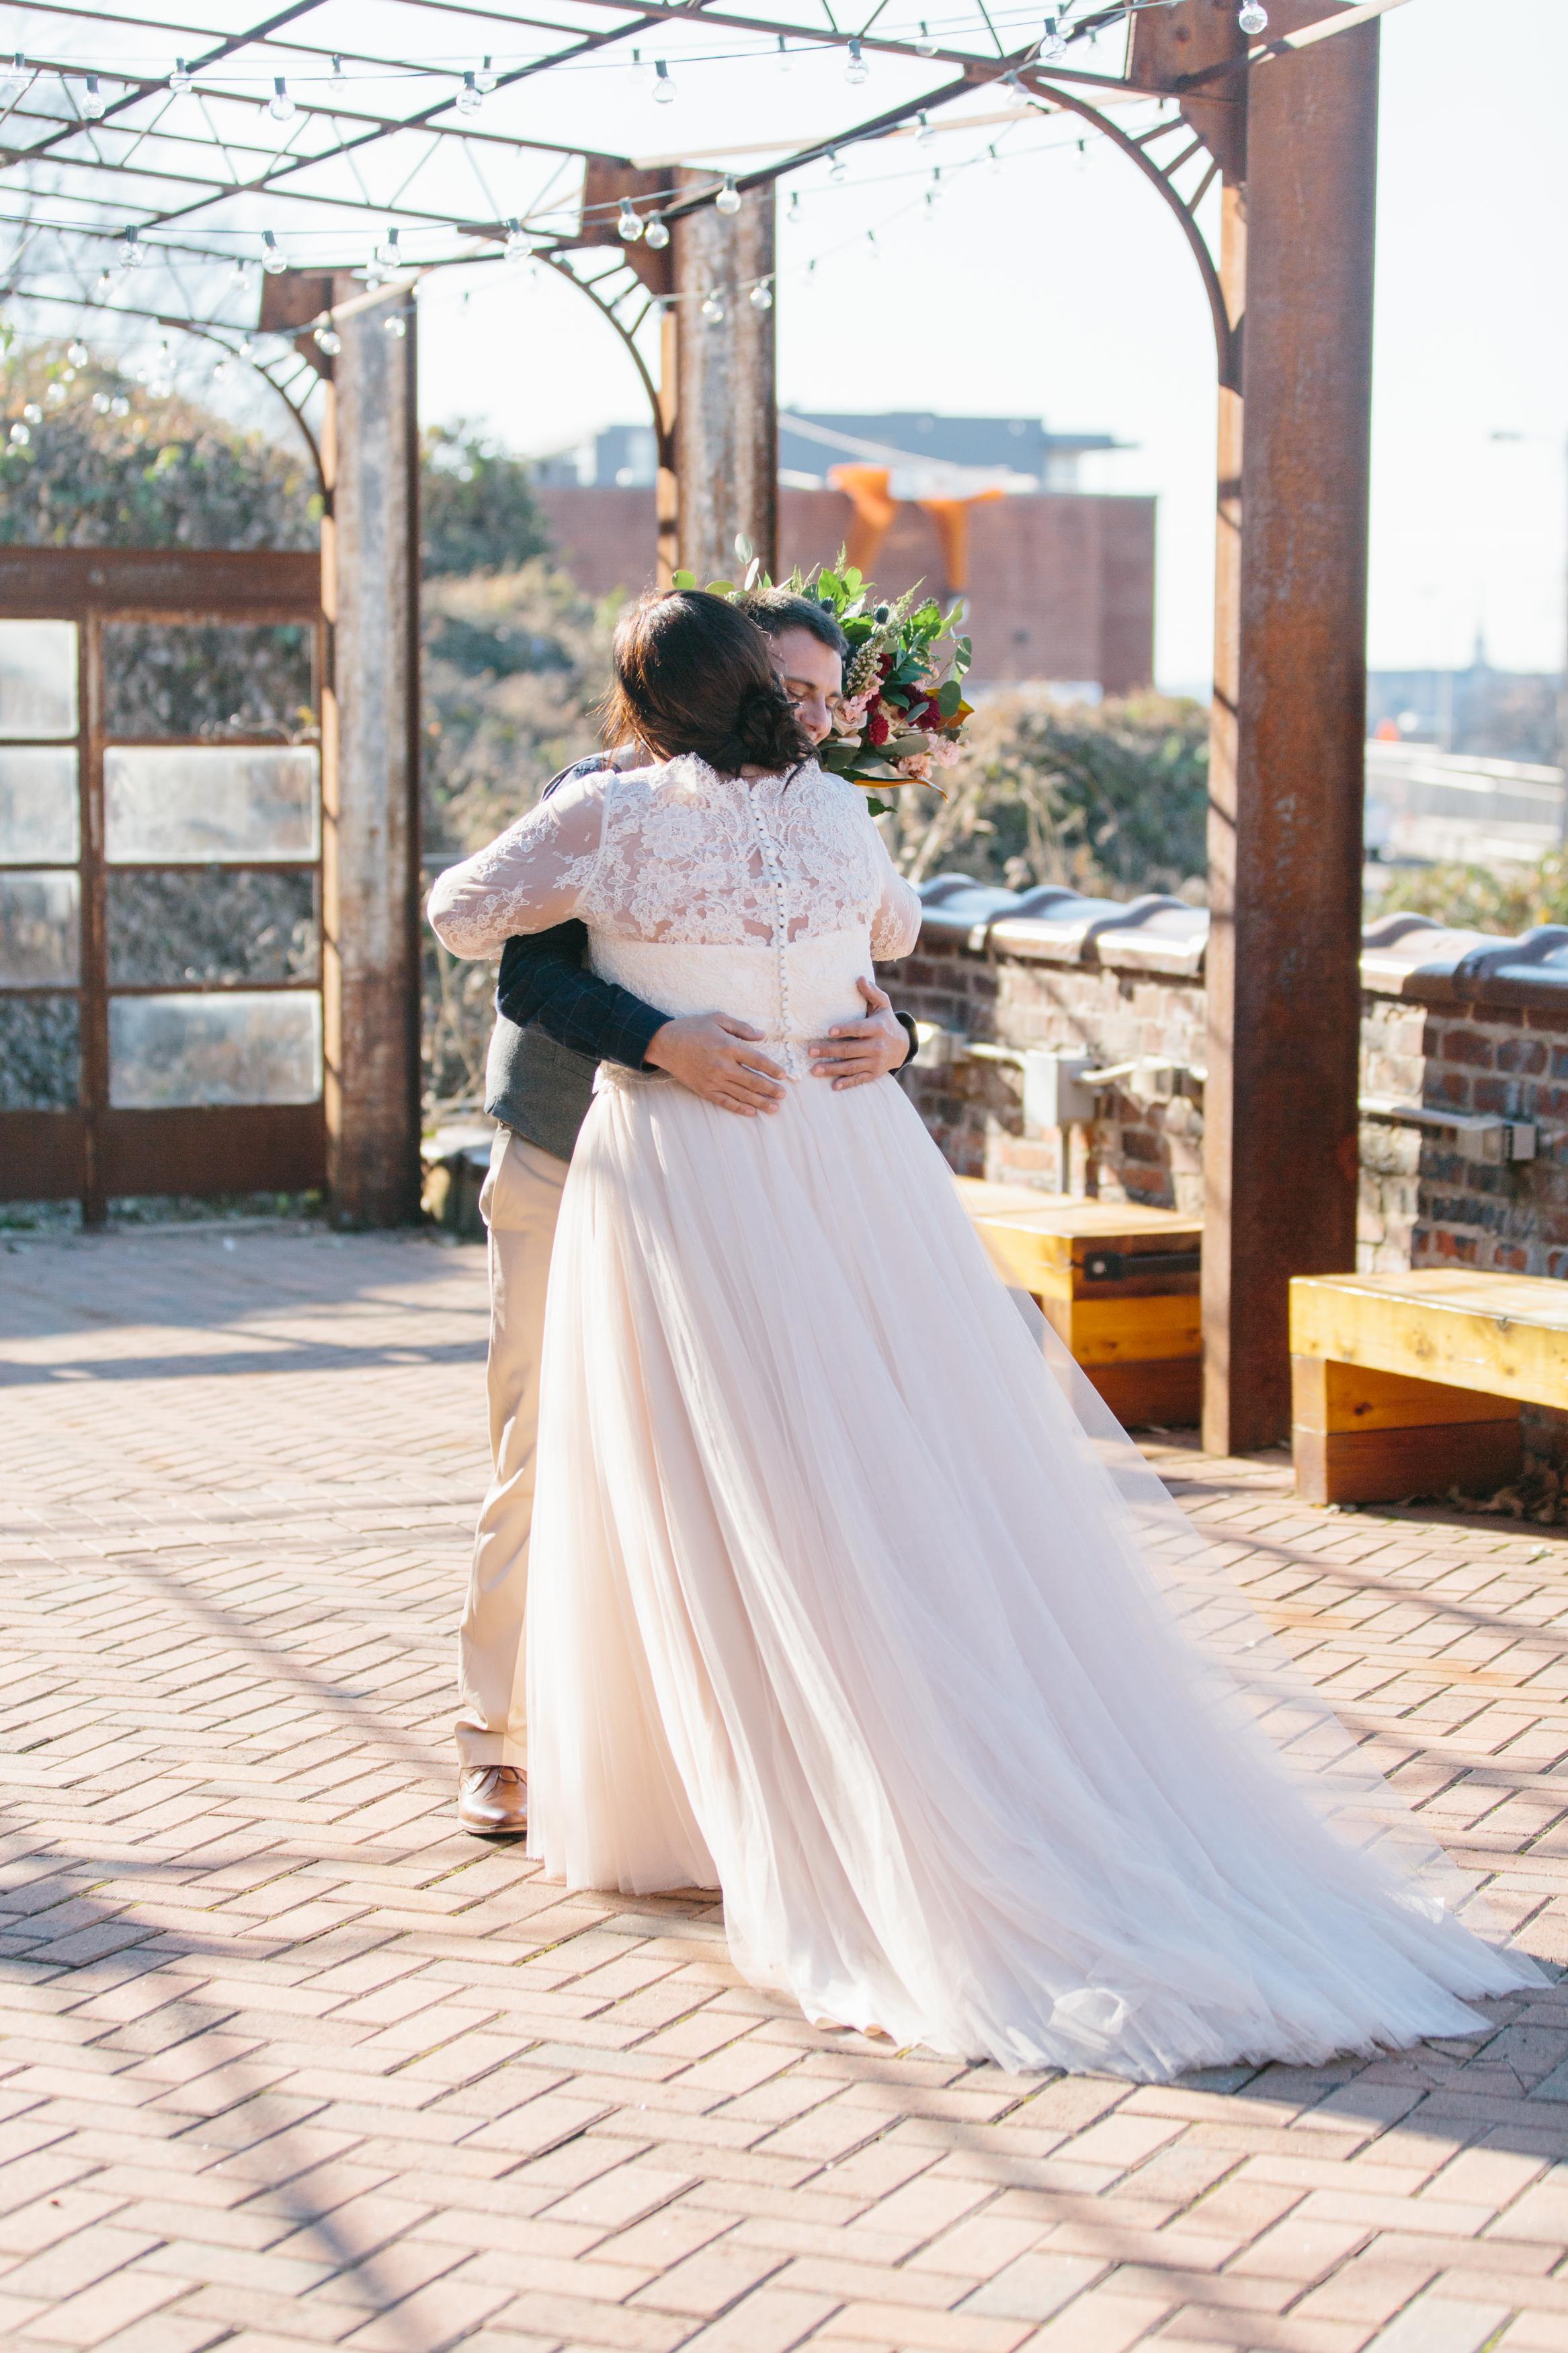 Lauren_Jeremy_Standard_Wedding_Knoxville_Abigail_Malone_Photography_FIlm-172.jpg